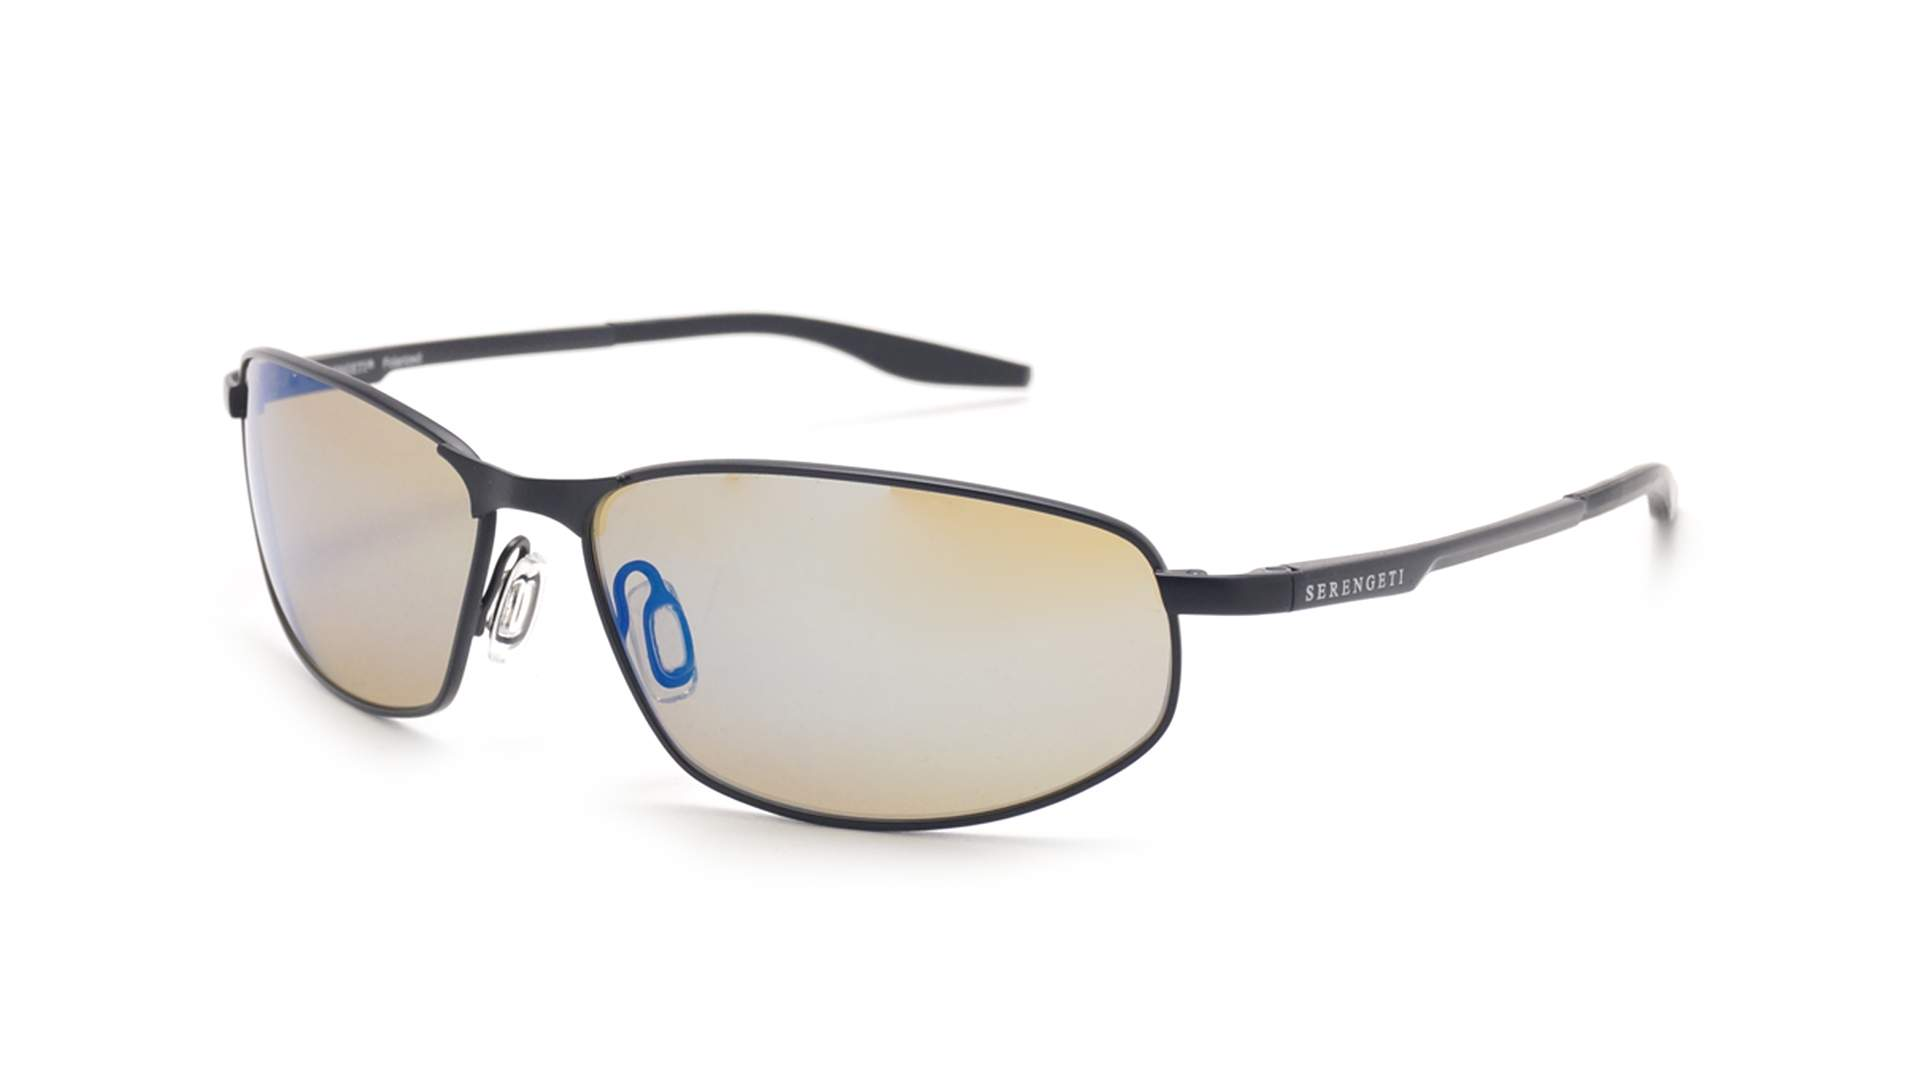 2df98c7bd44a Sunglasses Serengeti Matera Black Matte 8725 61-17 Large Polarized  Photochromic